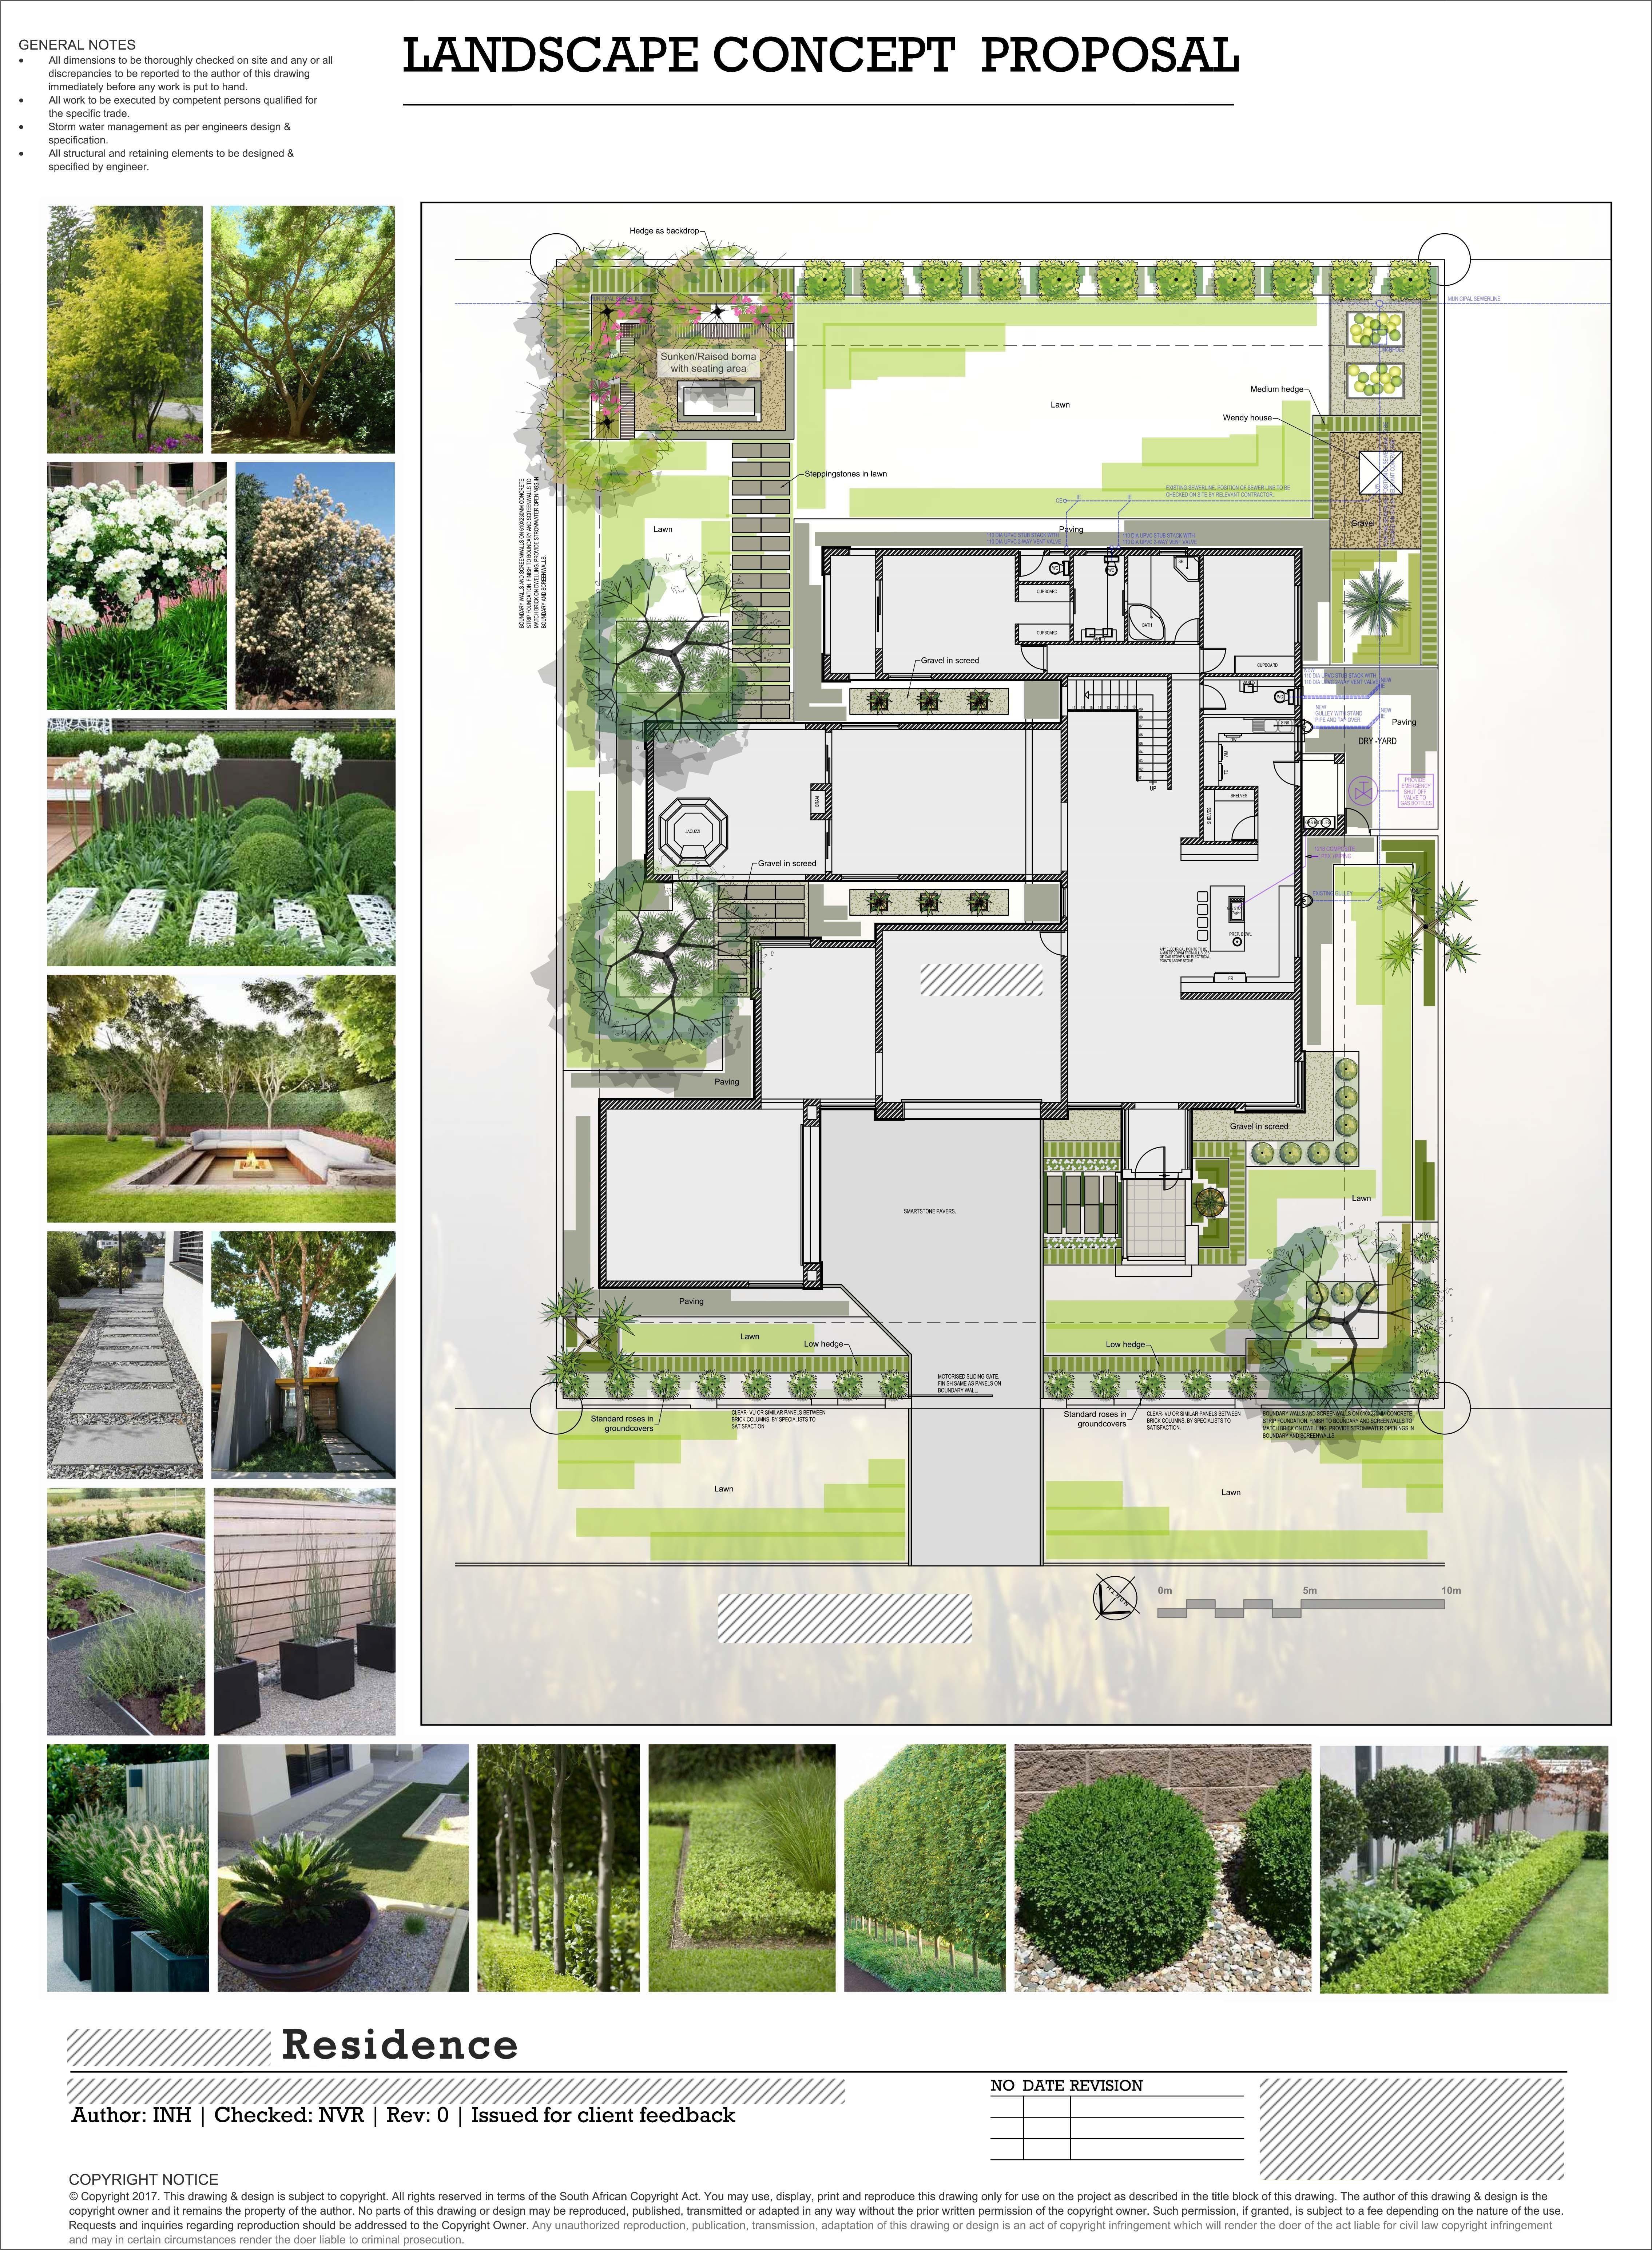 Architettura Del Verde sign up   Ландшафтные планы, Планы садового дизайна, Дизайн сада